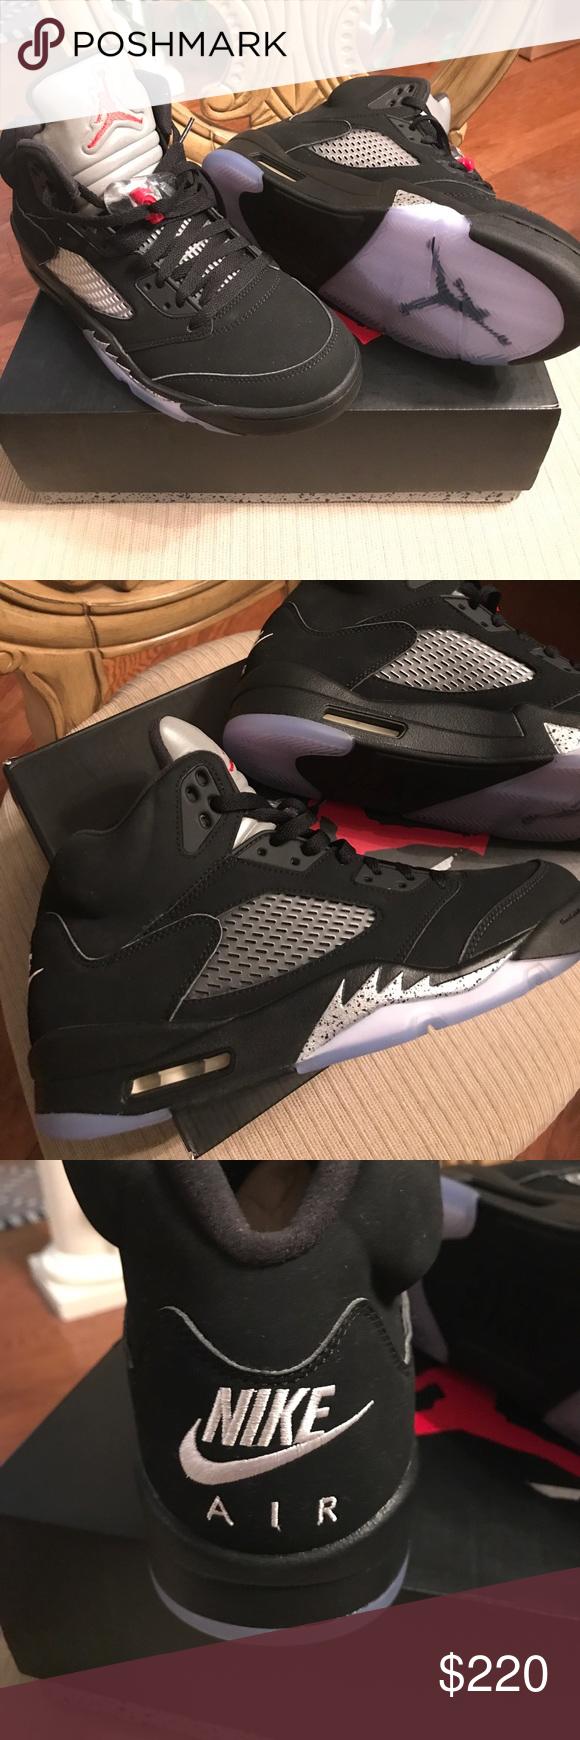 119efbea985 Nike Air Jordan's retro 5 OG Deadstock New PayPal only, No trades Jordan  Shoes Sneakers